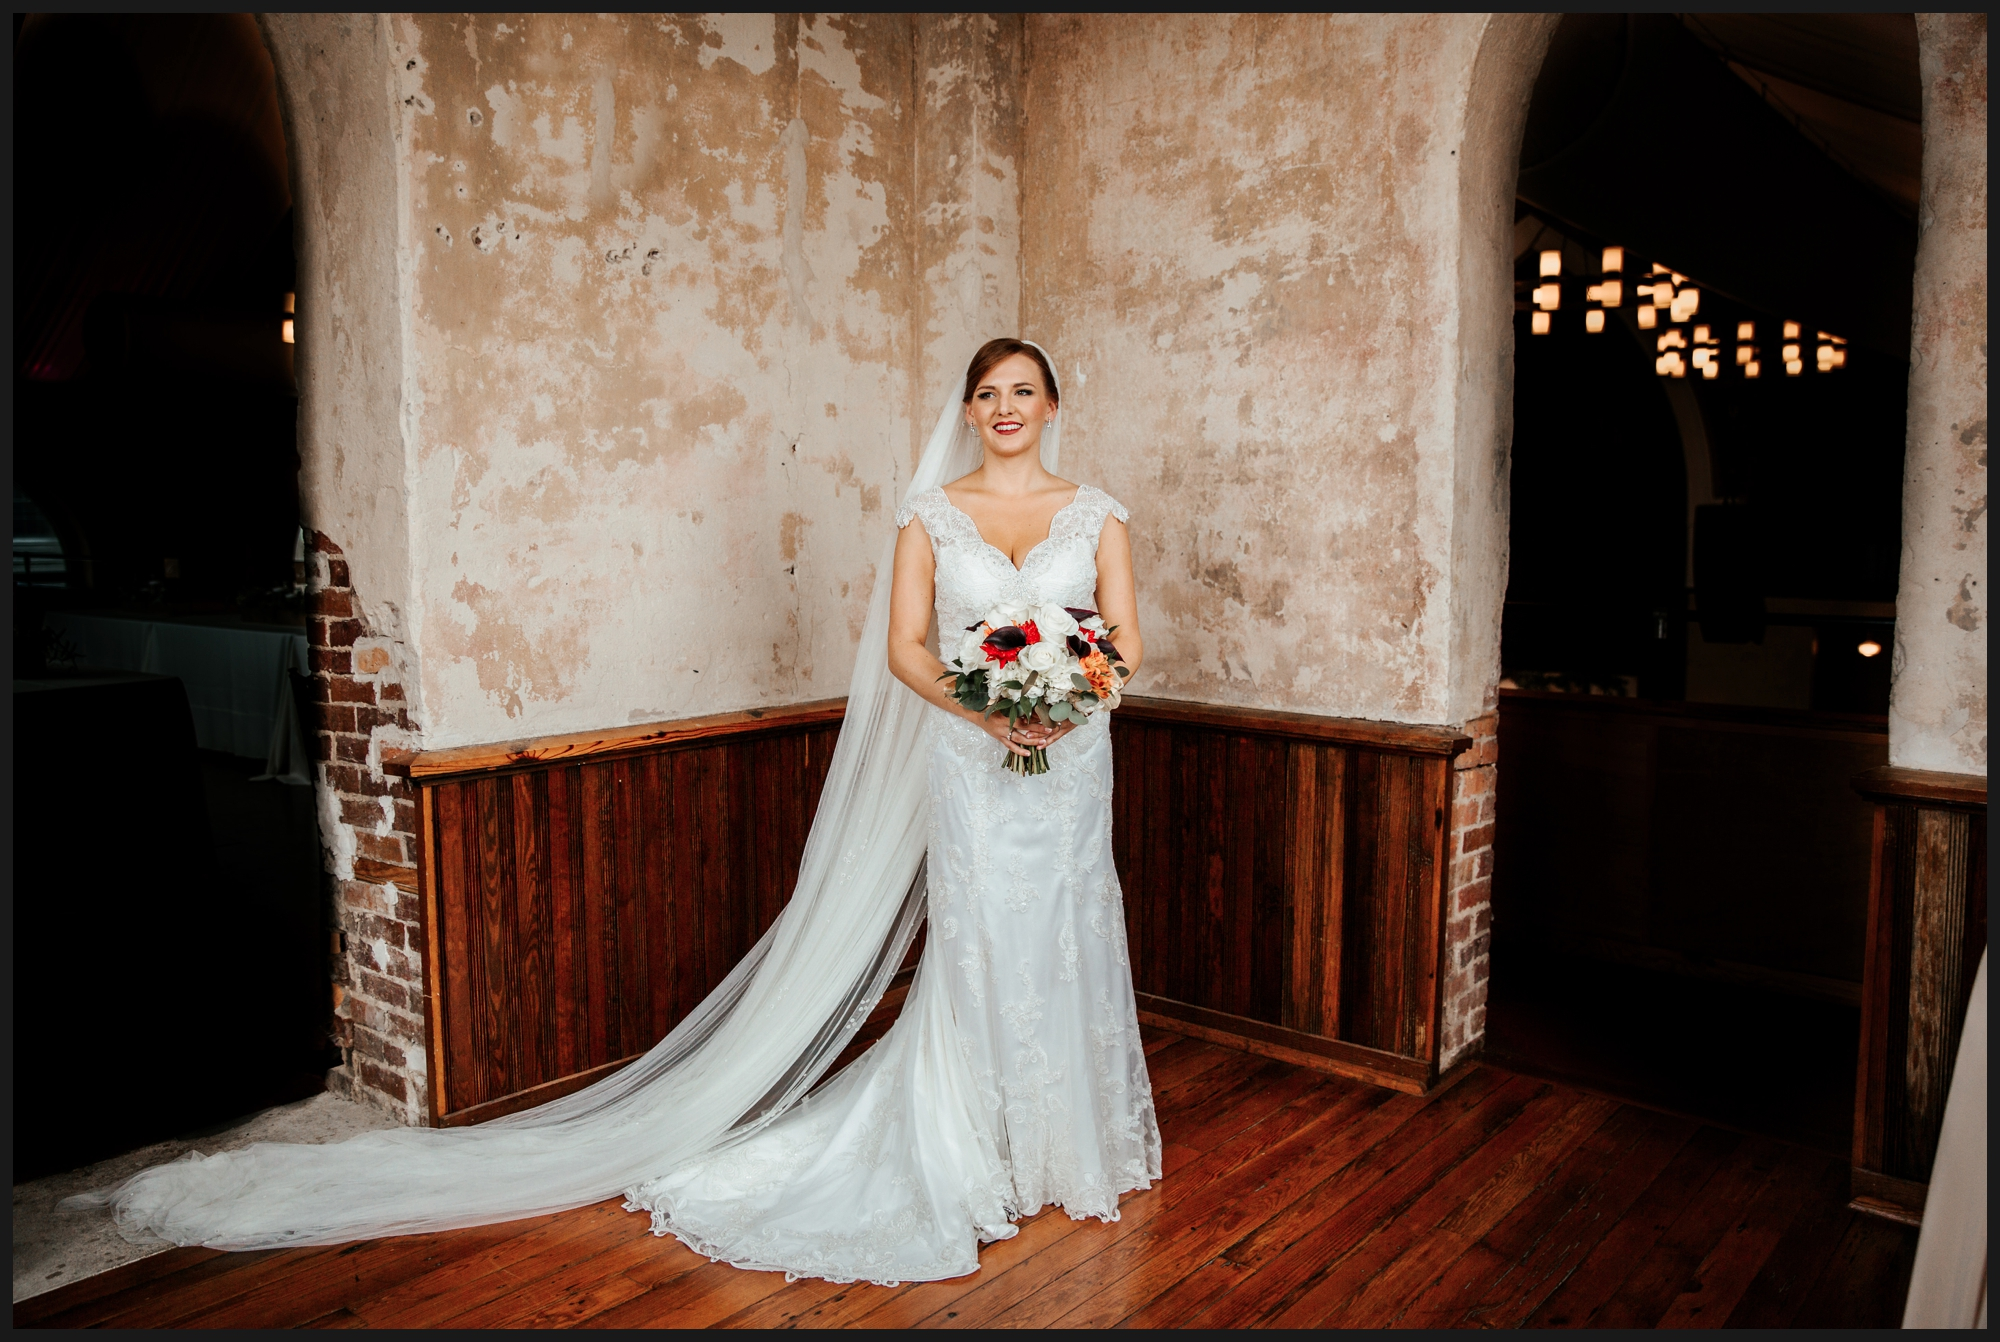 Orlando-Wedding-Photographer-destination-wedding-photographer-florida-wedding-photographer-bohemian-wedding-photographer_0602.jpg